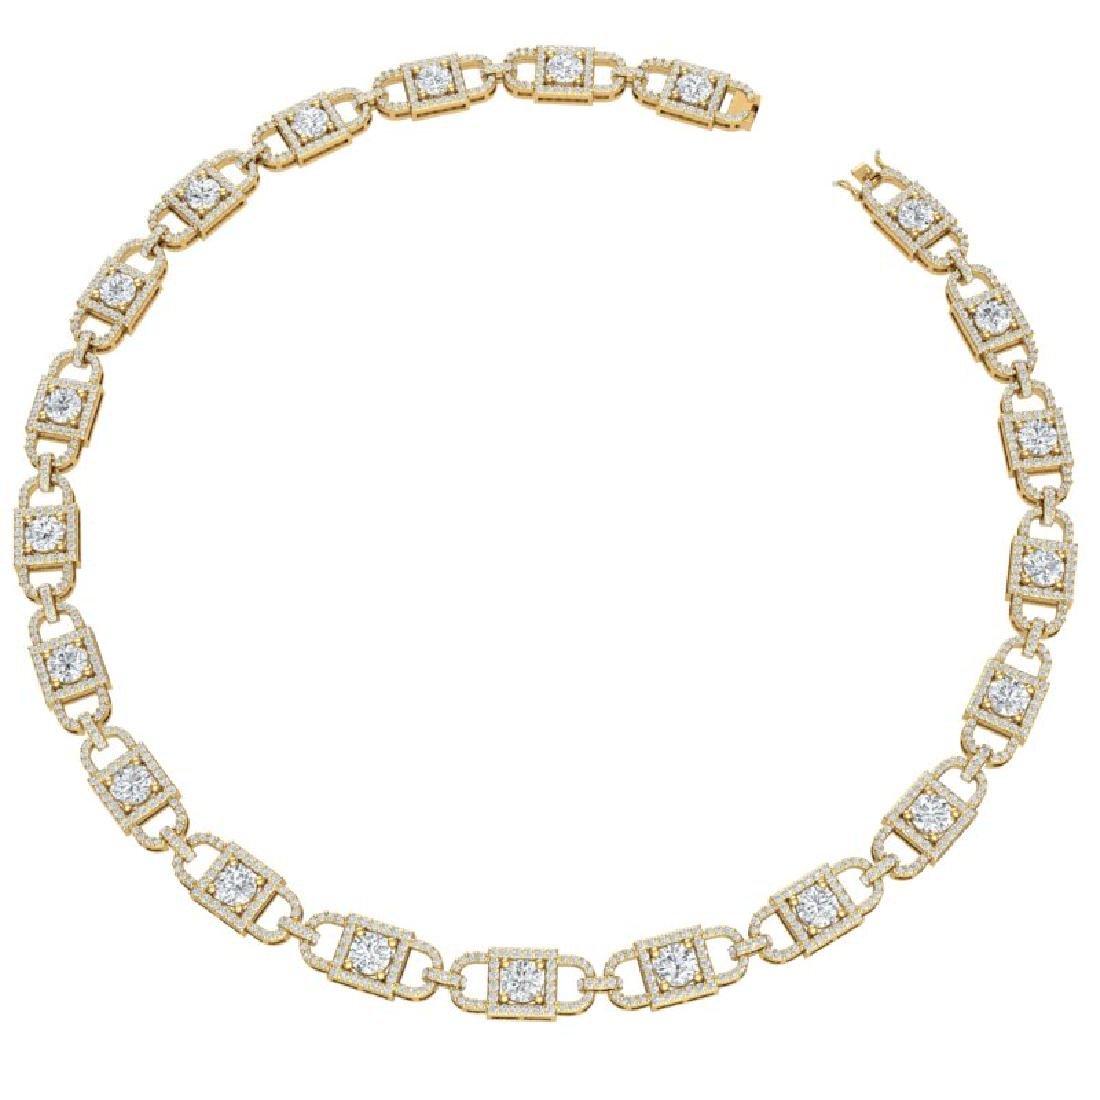 20 CTW Certified SI/I Diamond Halo Necklace 18K Yellow - 3